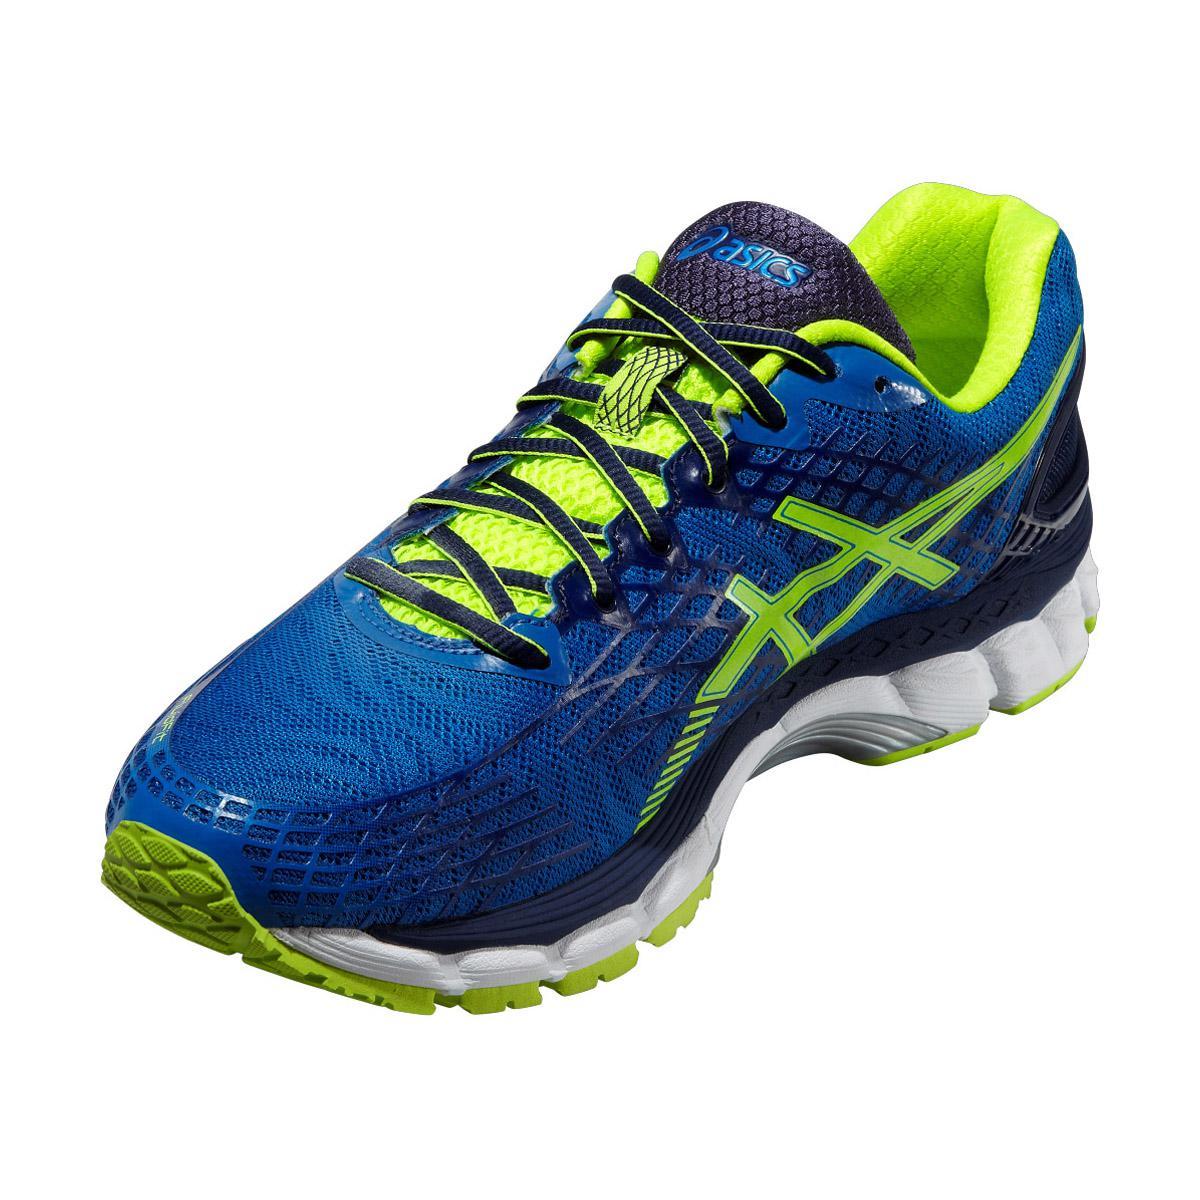 Womens Asics Gel Noosa TRI 7 Purple Yellow Chlorine Blue ... |Maroon And Yellow Asics Shoes